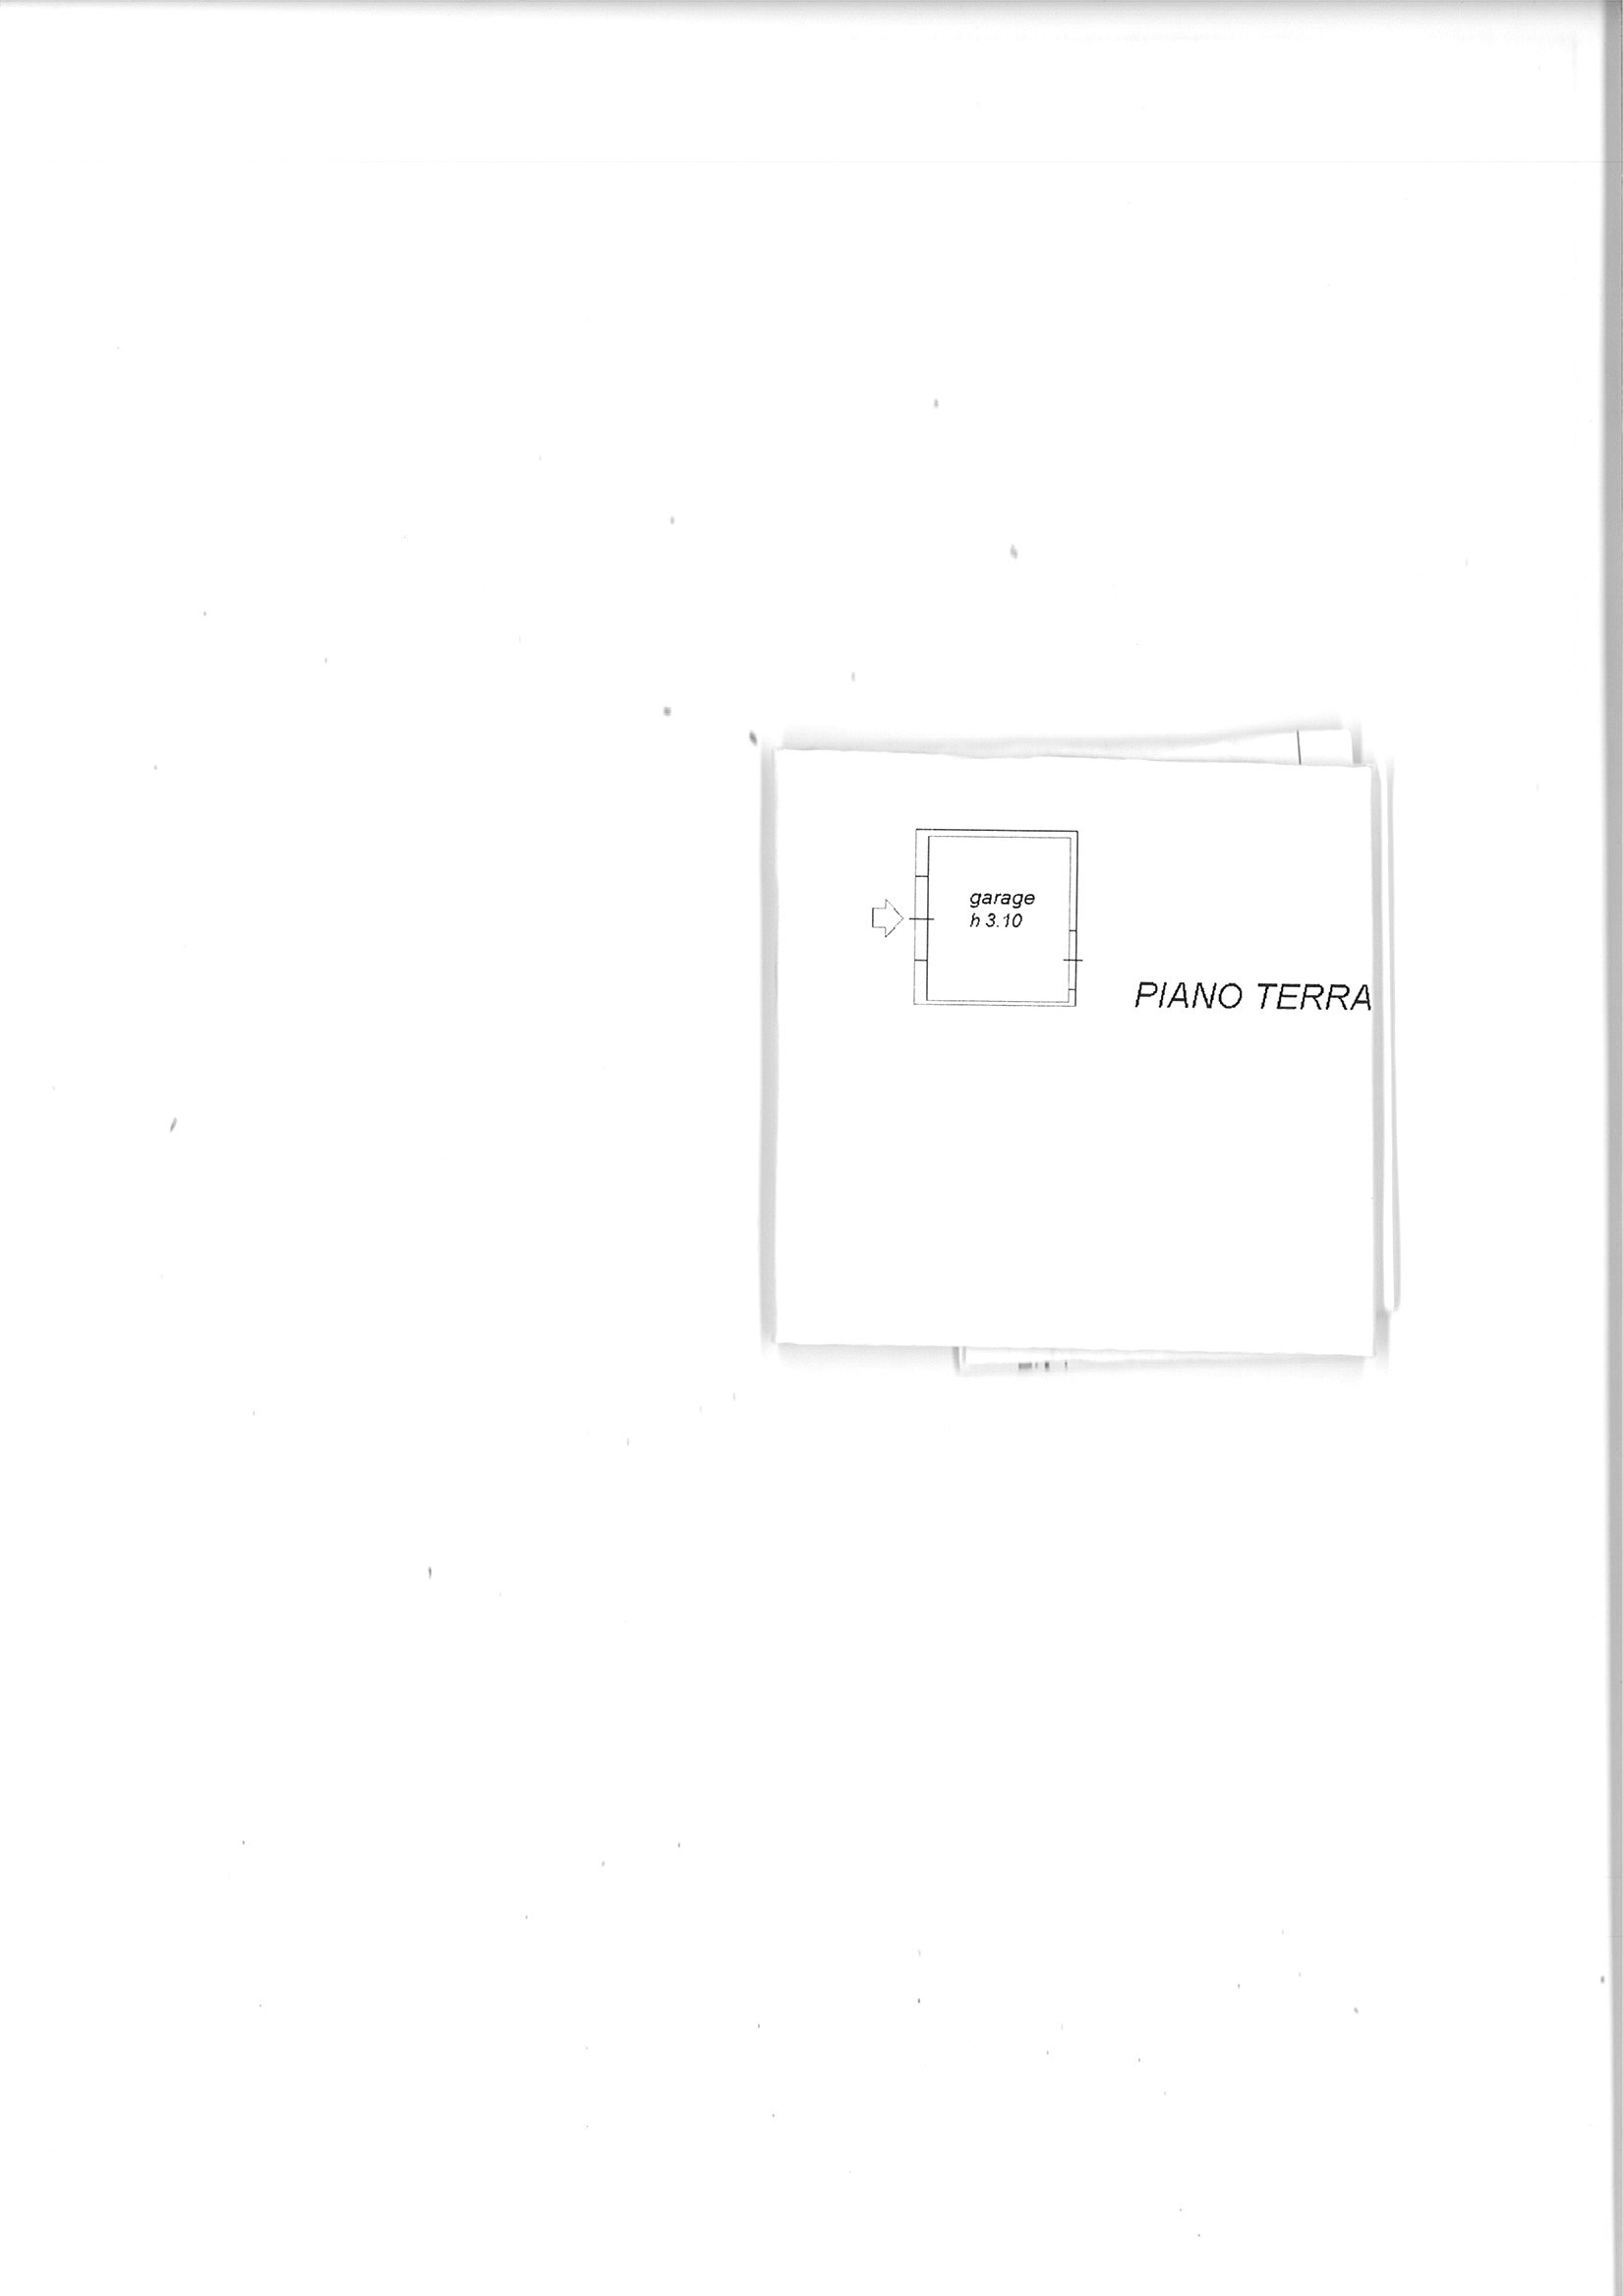 Planimetria 2/2 per rif. capan gragn 155